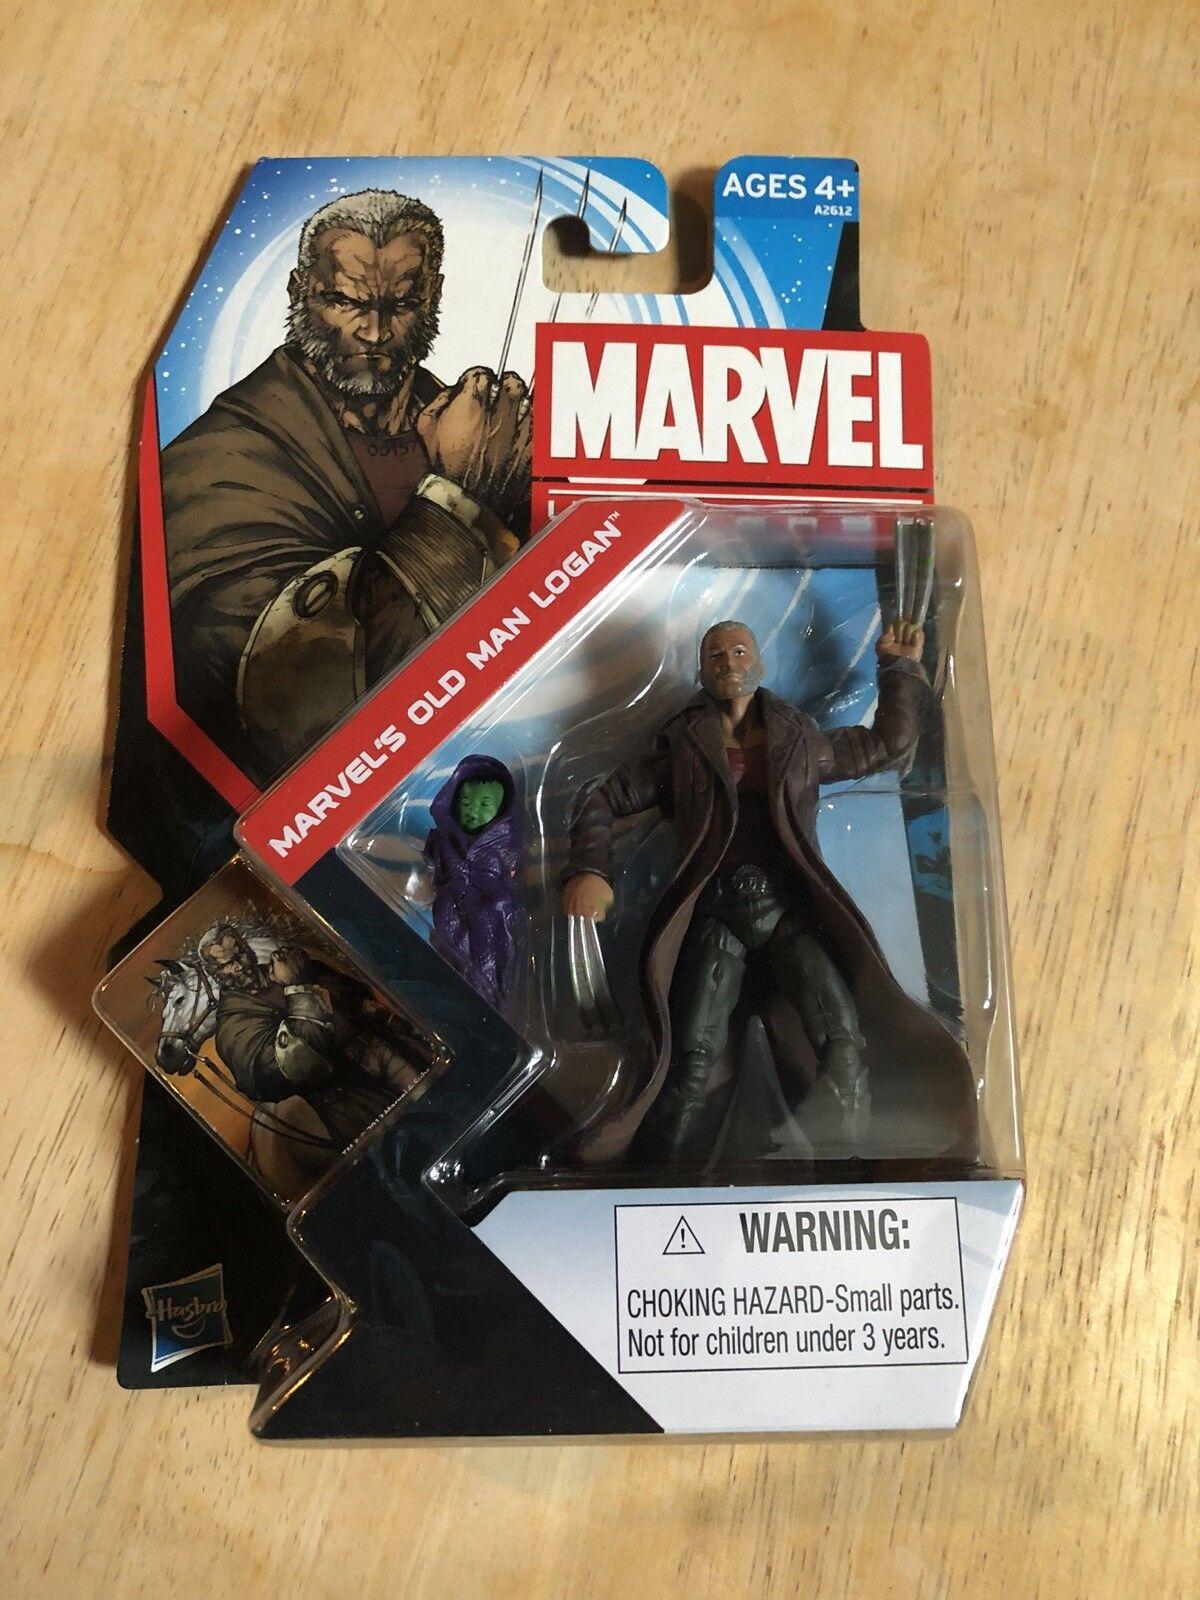 Marvel Universe 2013 SDCC Exclusive Old Man Logan & Baby Hulk Figure Comic Con